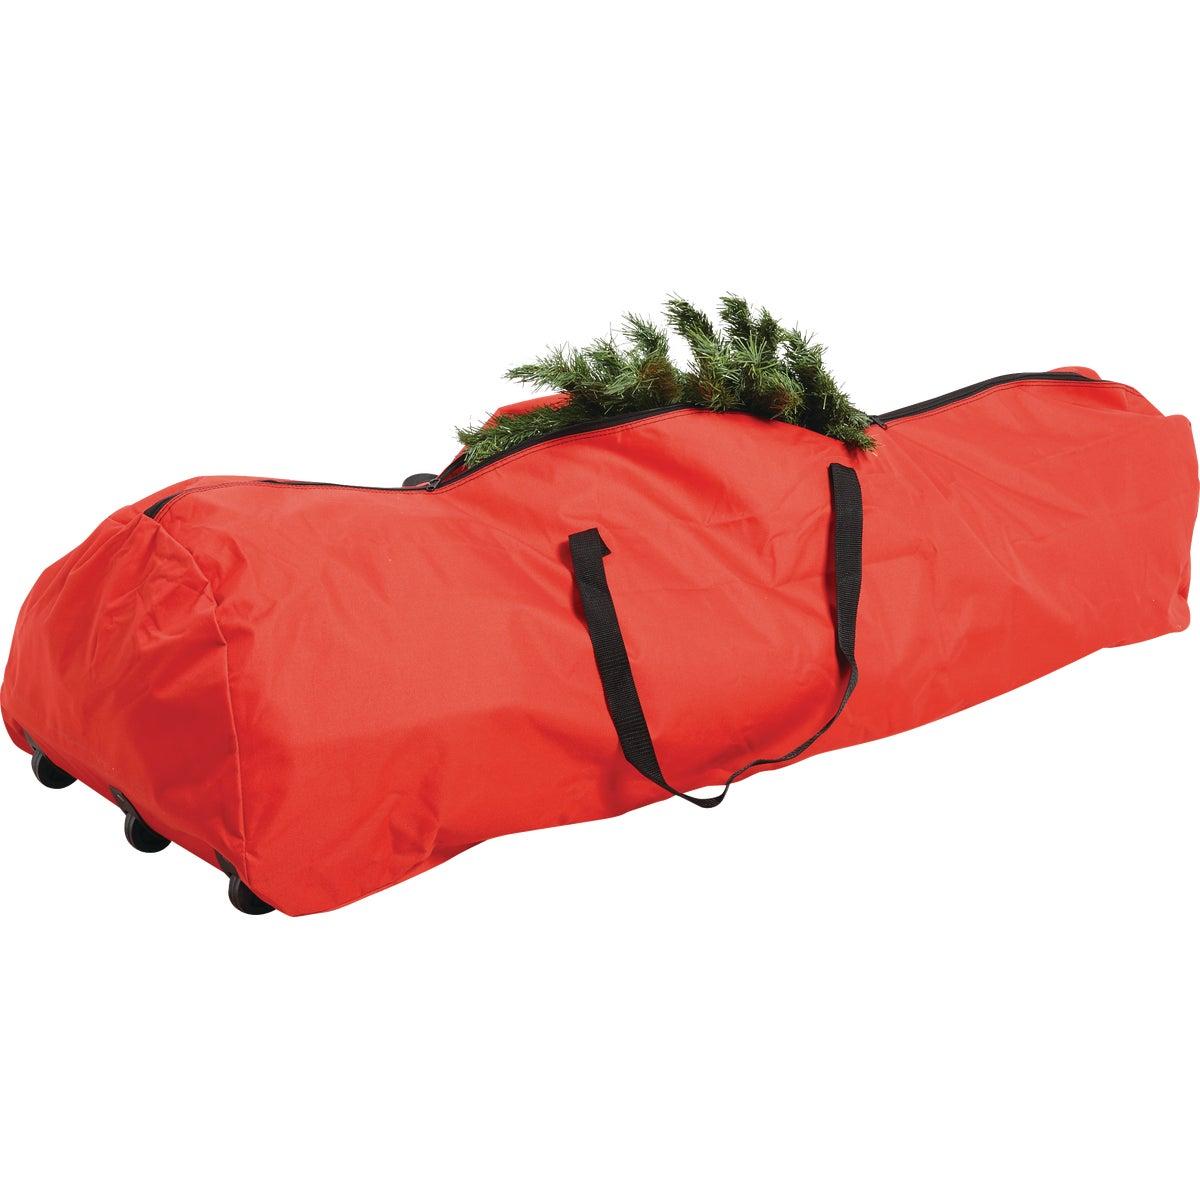 Dyno Seasonal Solutions Rolling Tree Storage Bag at Sears.com